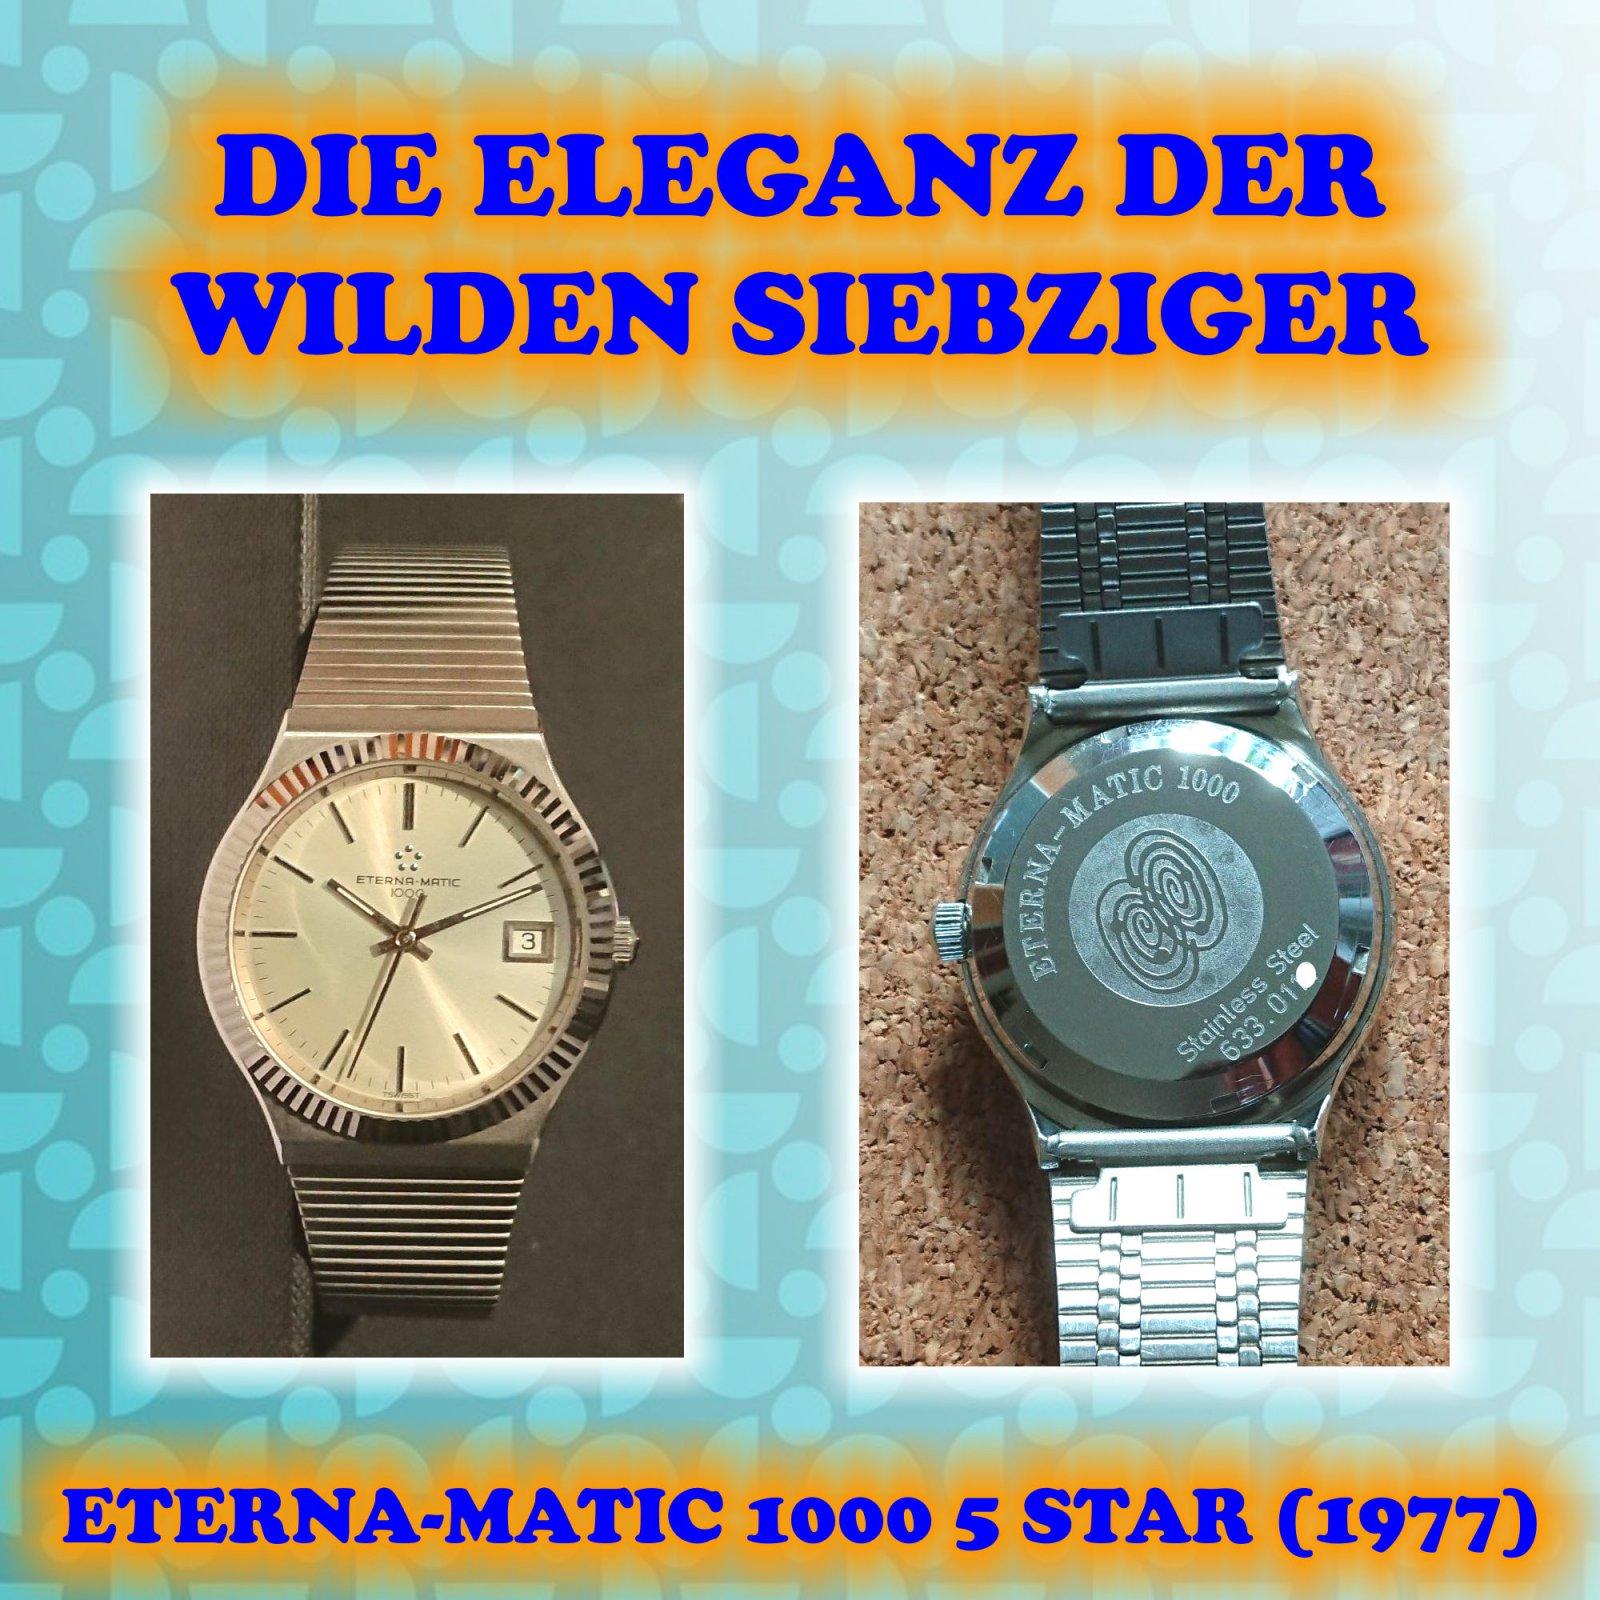 ETERNA MATIC 1000 5 STAR.jpg